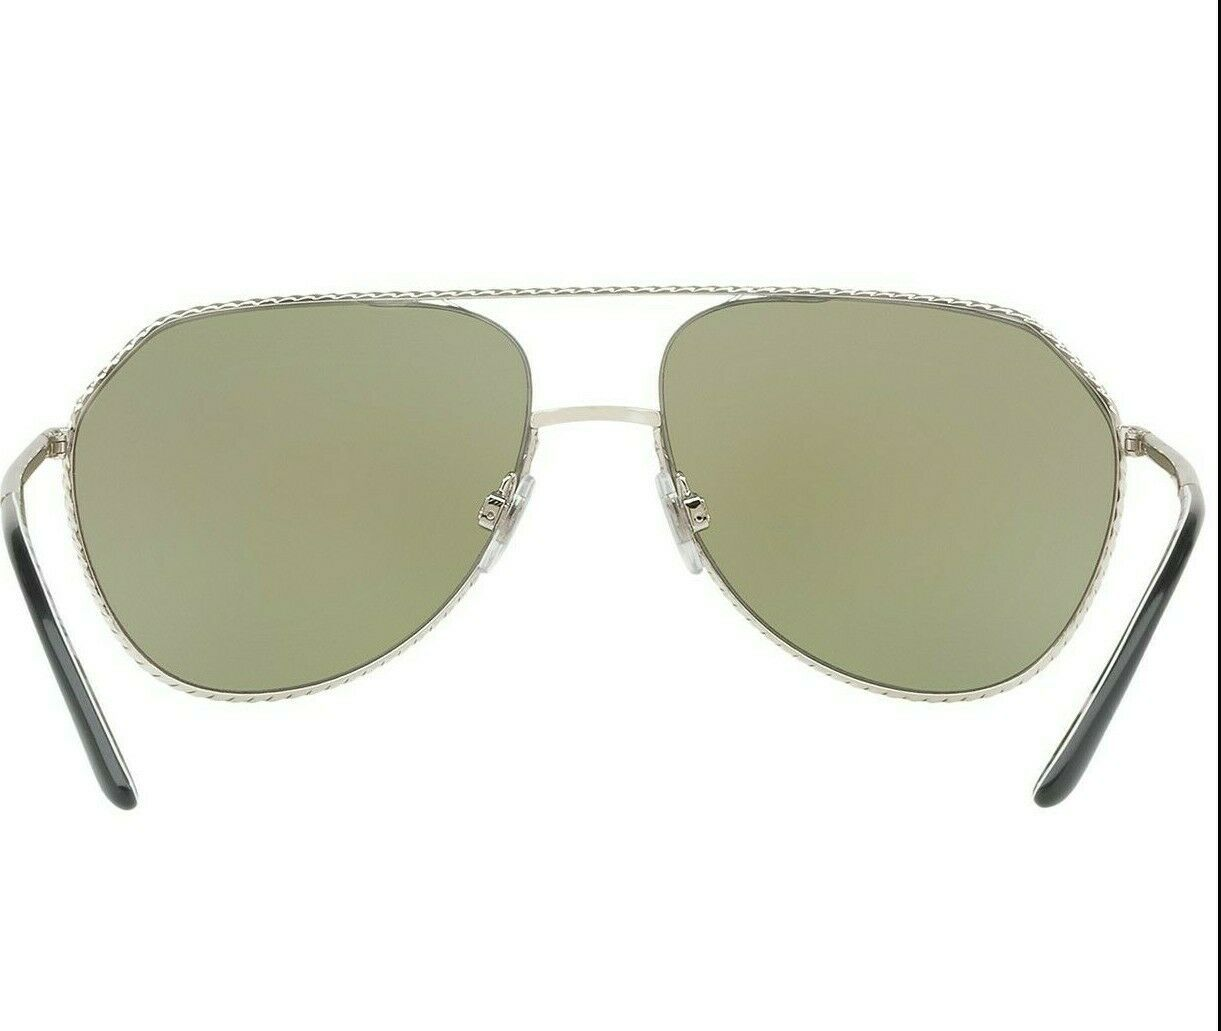 Dolce & Gabbana Pilot DG2191  Silver Frame Lilac Grey Mirror Lens Sunglasses image 4